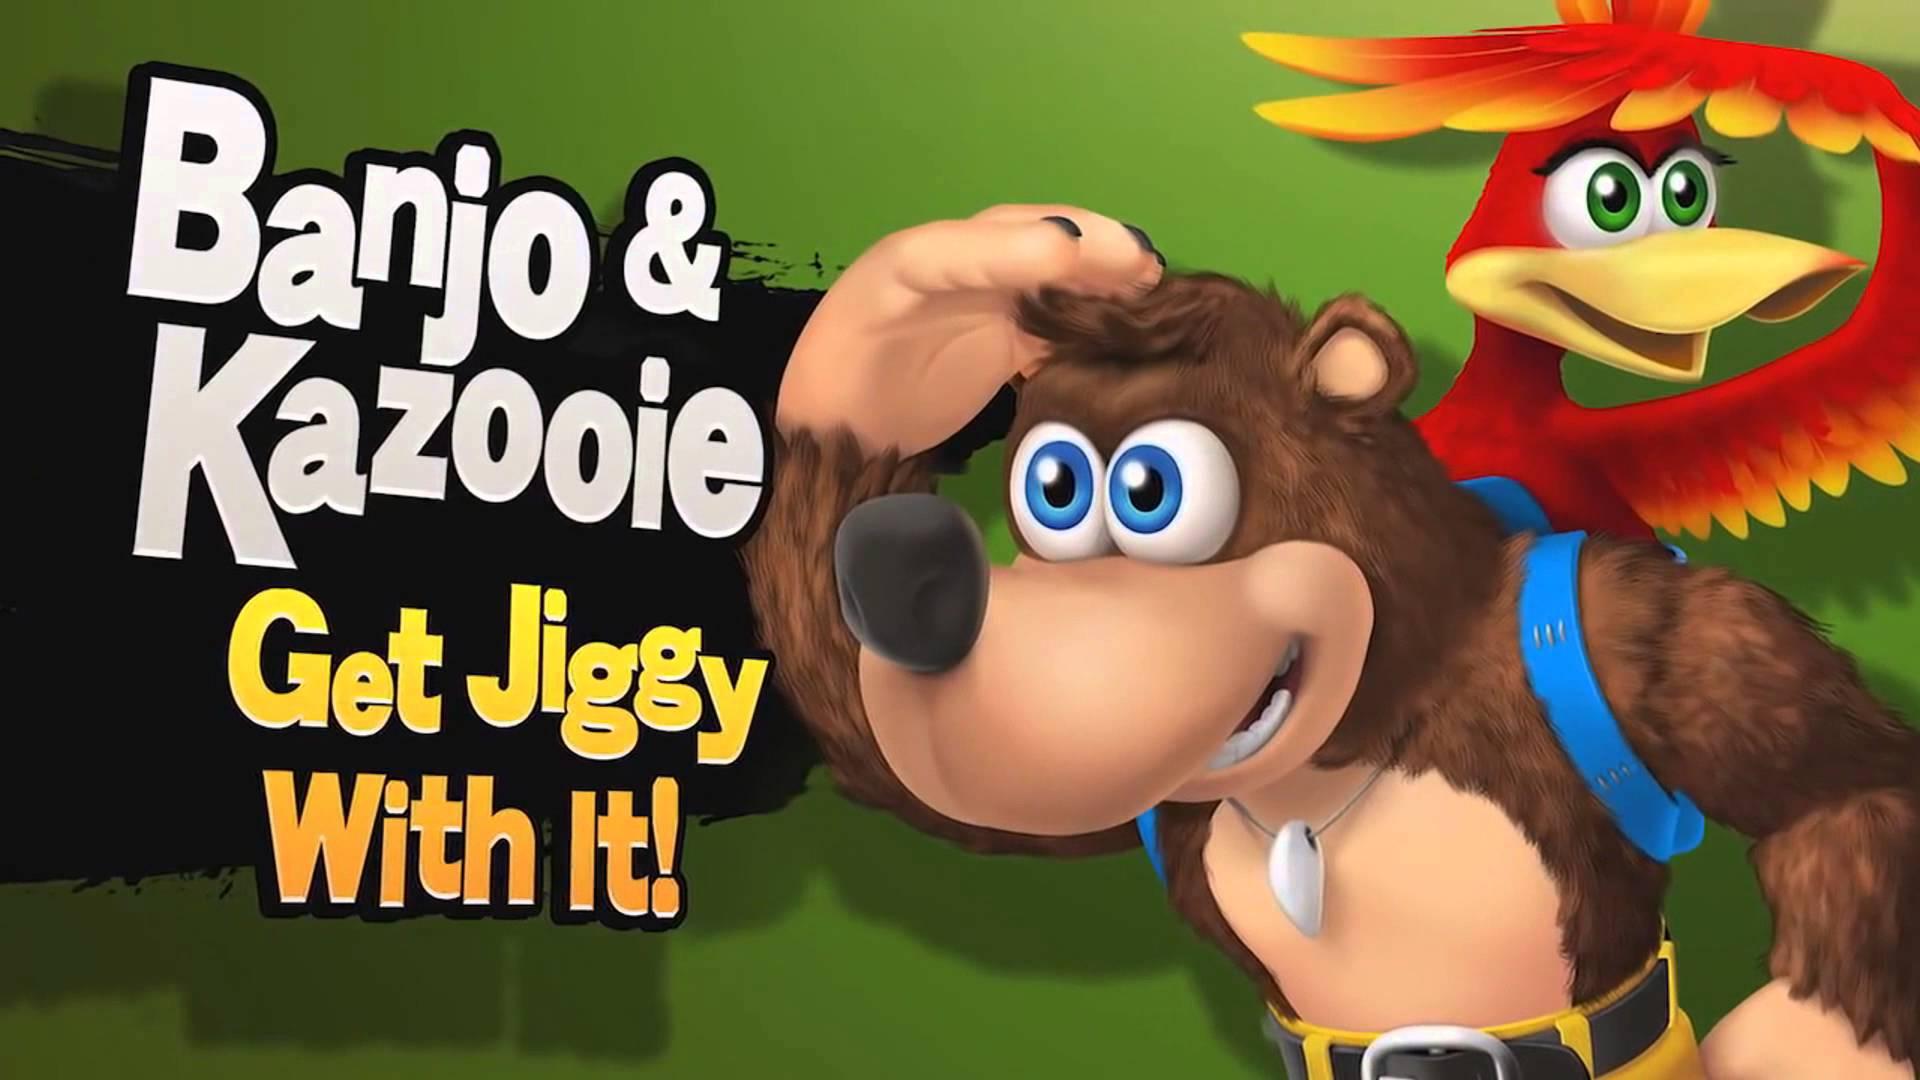 E3 Nintendo] Banjo-Kazooie enter the Super Smash Bros  Ultimate roster